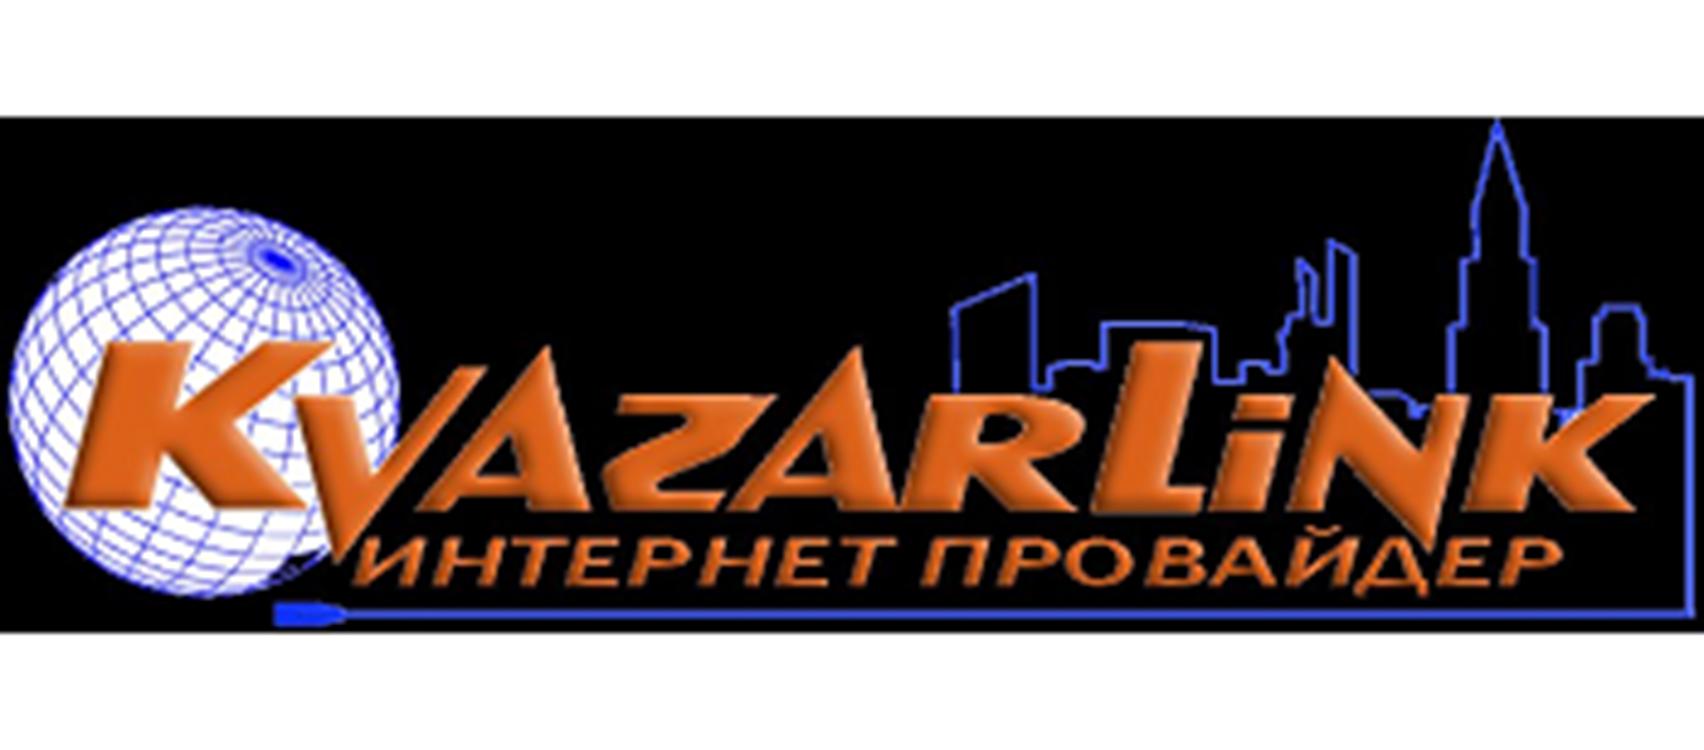 КВАЗАР-ЛІНК (Мелитополь)